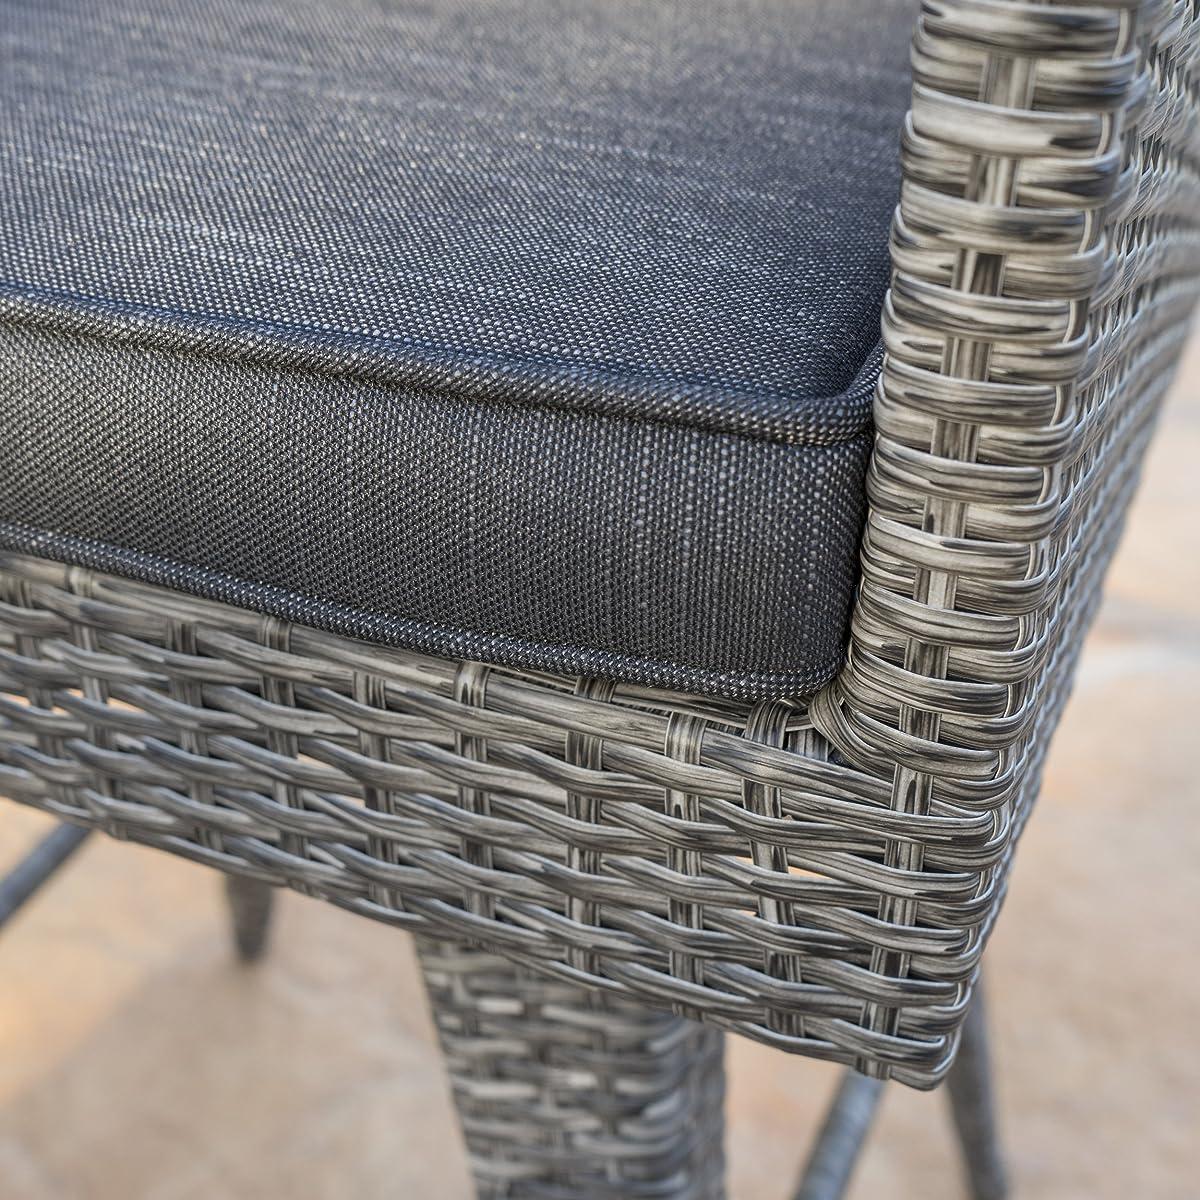 Venice Patio Furniture ~ 5 Piece Outdoor Wicker Dining / Bar Set (Black and Grey)